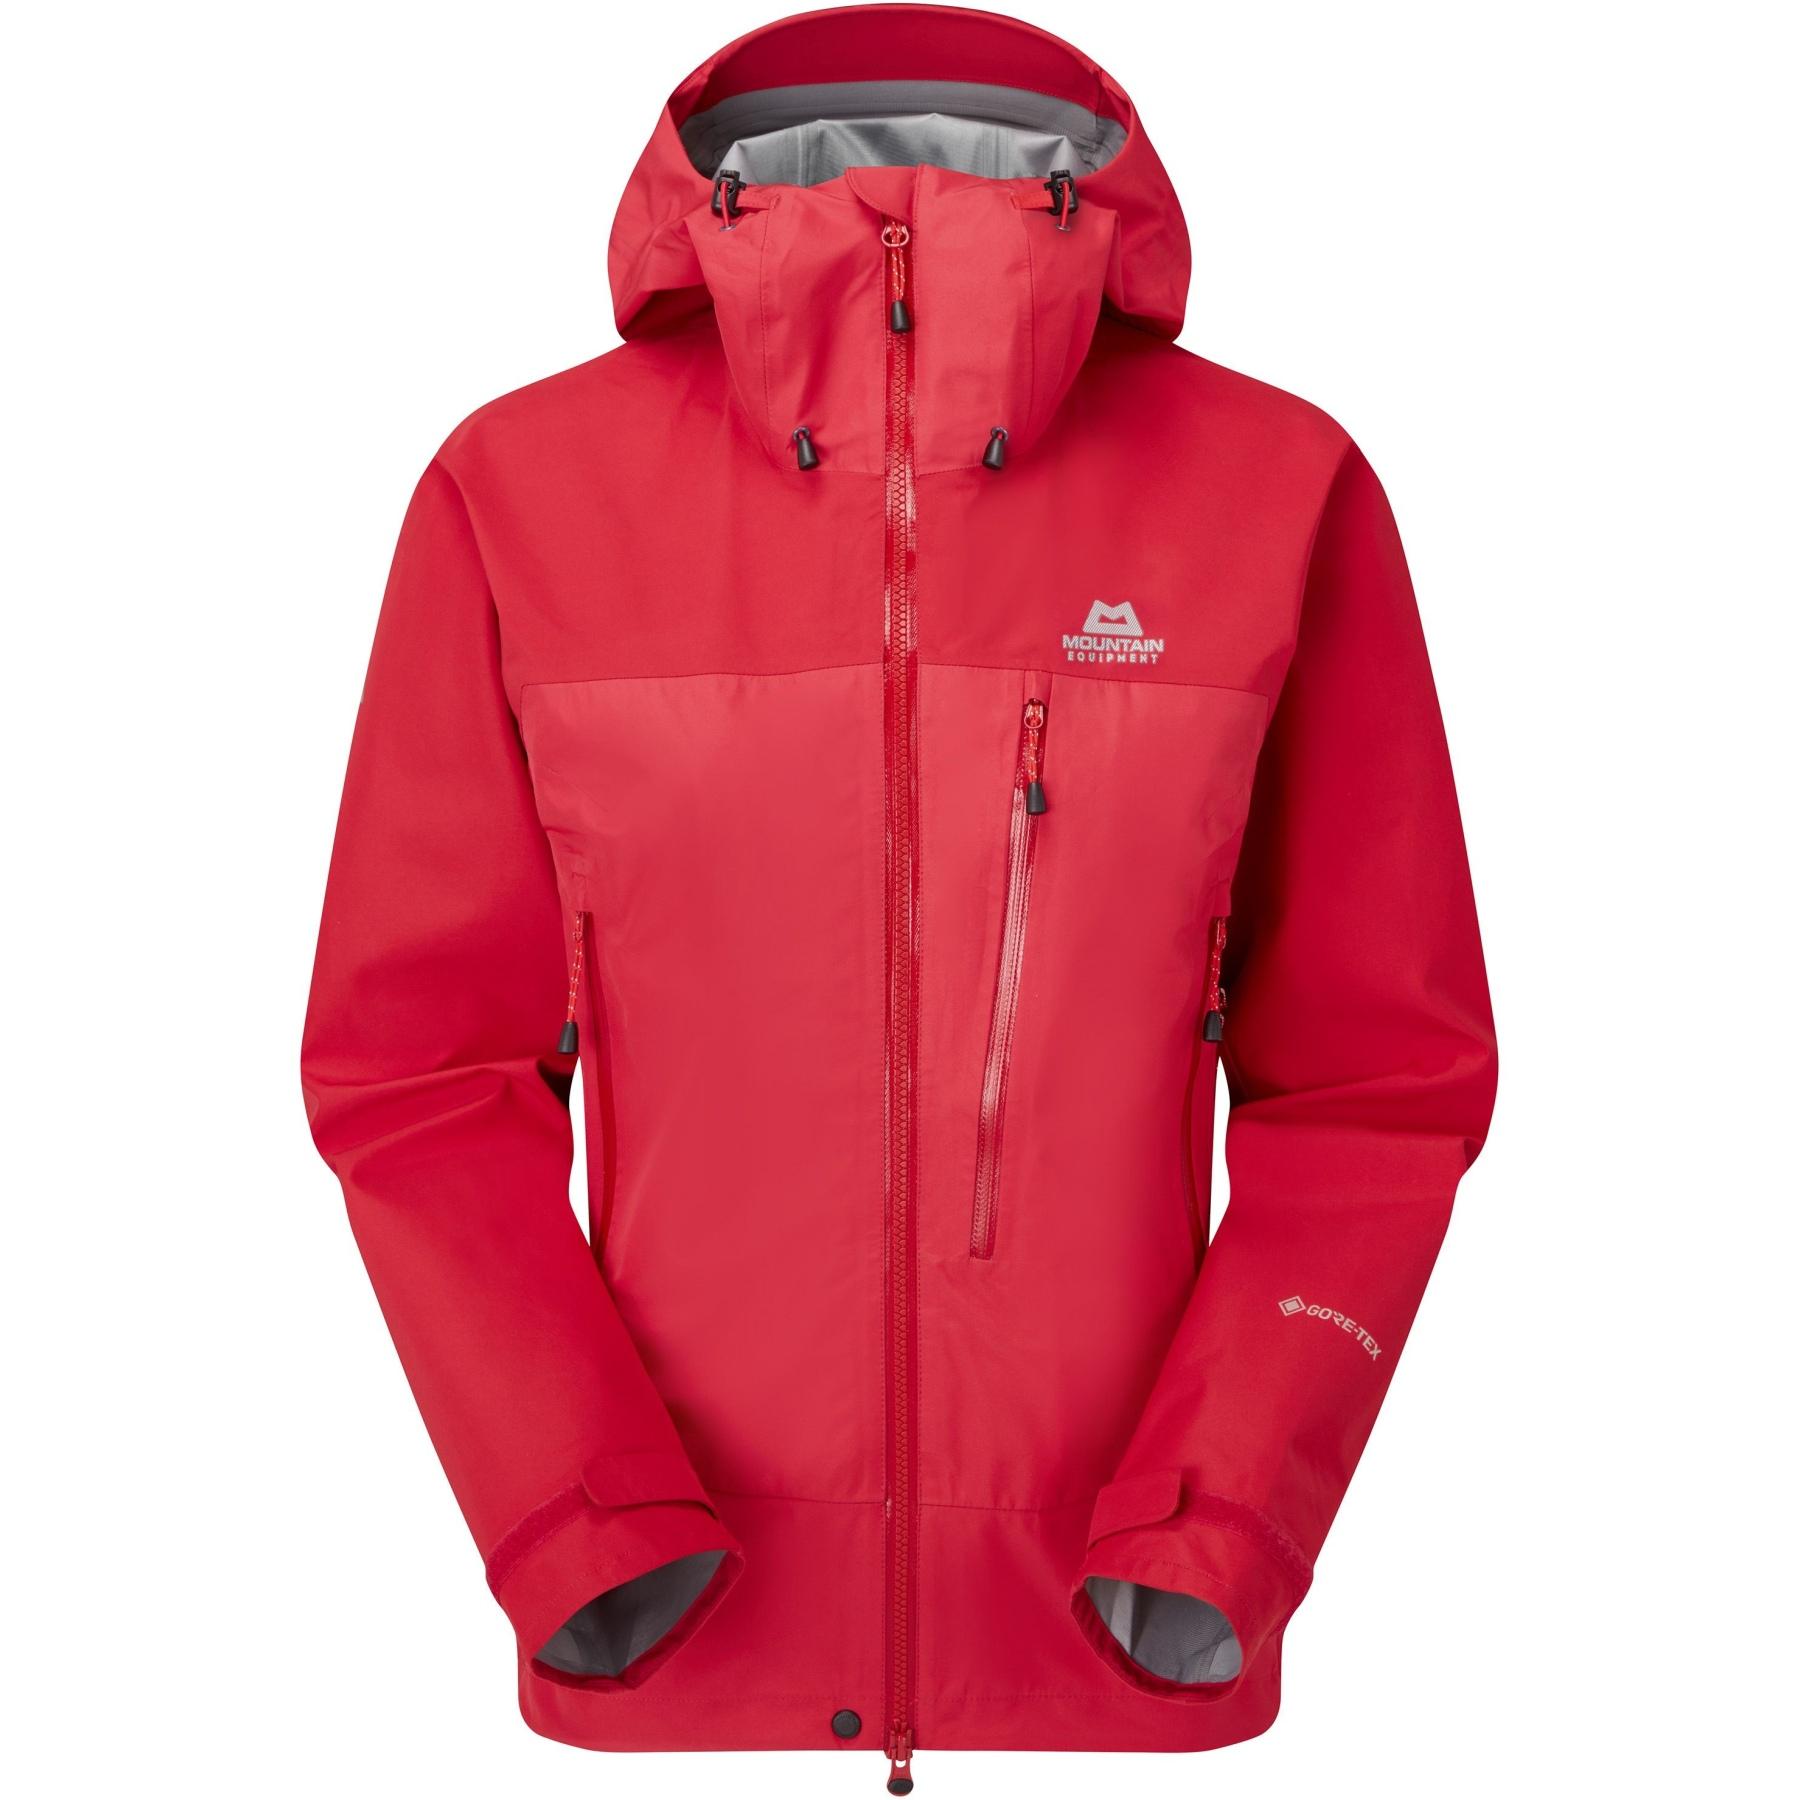 Produktbild von Mountain Equipment Makalu Damenjacke ME-005844 - capsicum red